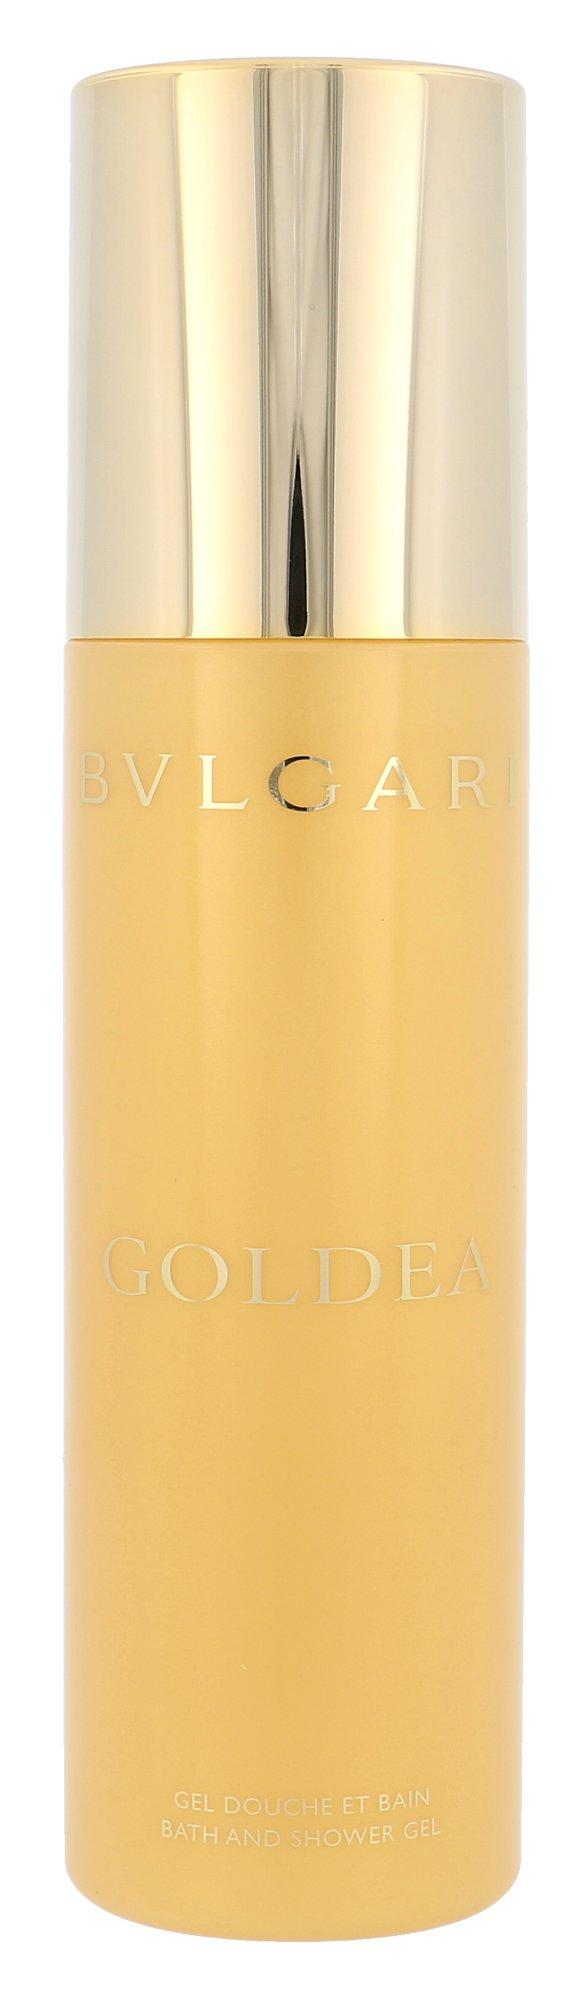 Bvlgari Goldea, tusfürdő gél 200ml